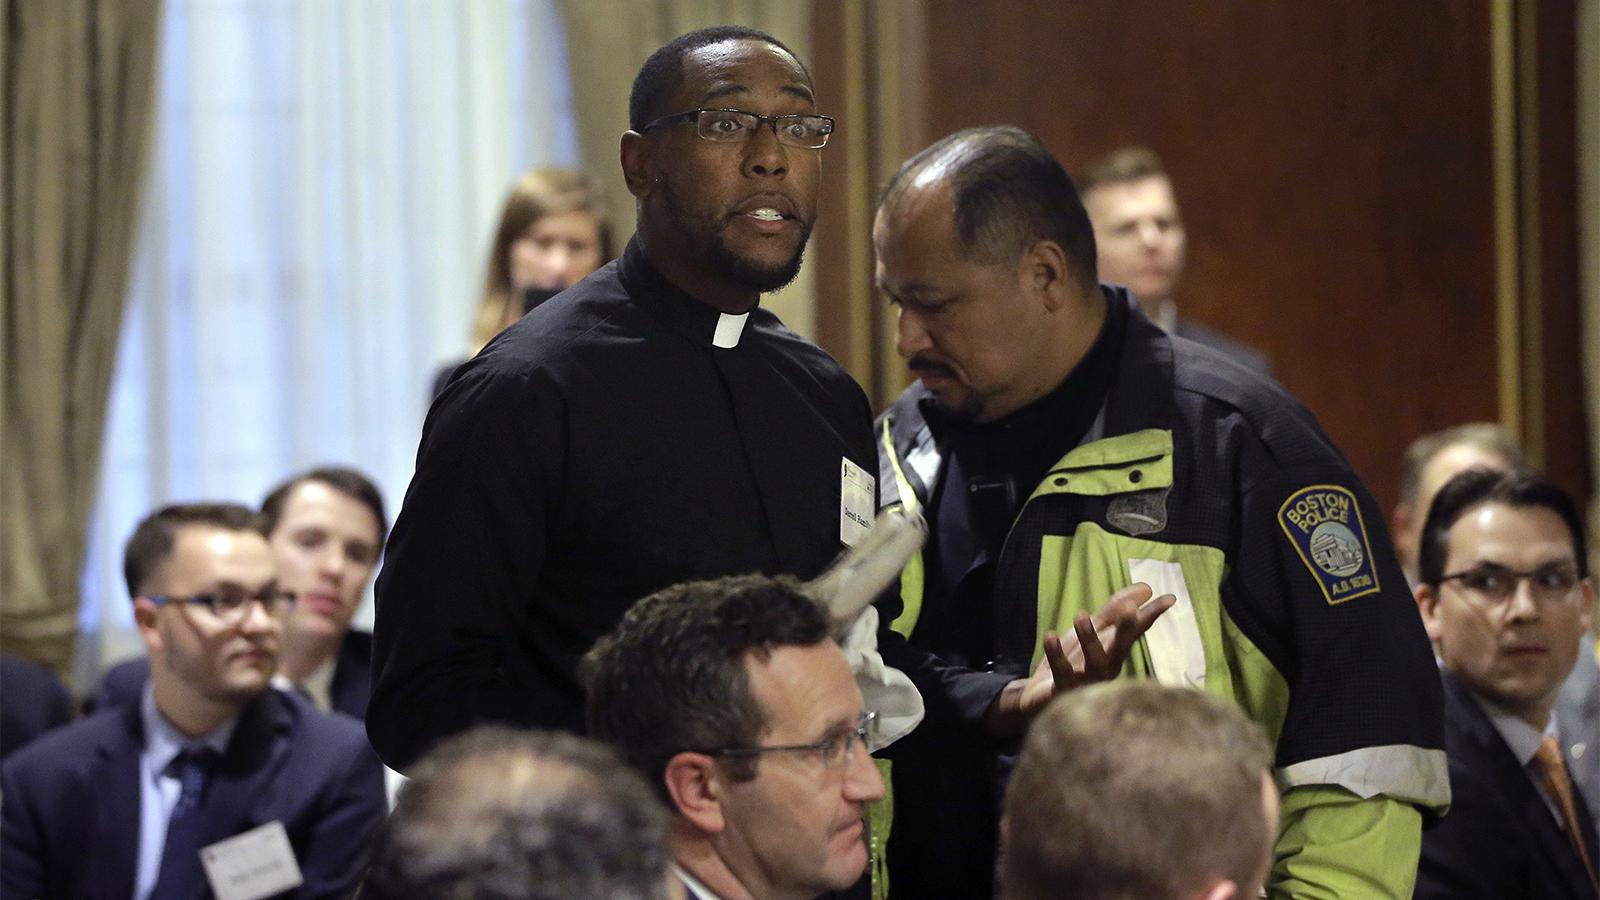 Jeff Sessions speech interrupted by Methodist, Baptist